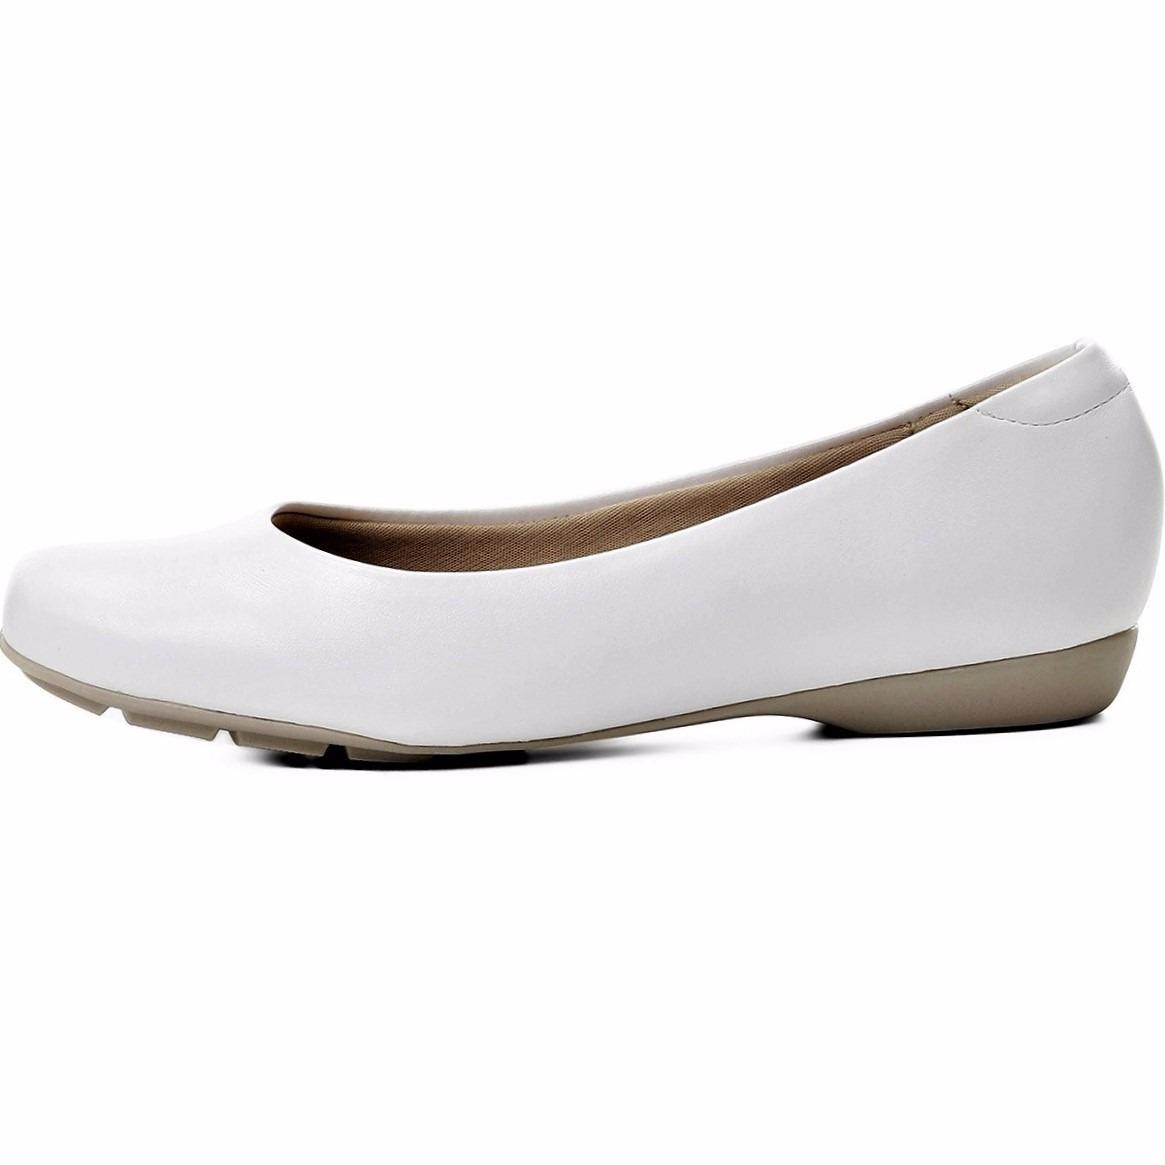 26a0eacdb1 sapato sapatilha branco enfermagem clinica area da saude. Carregando zoom.